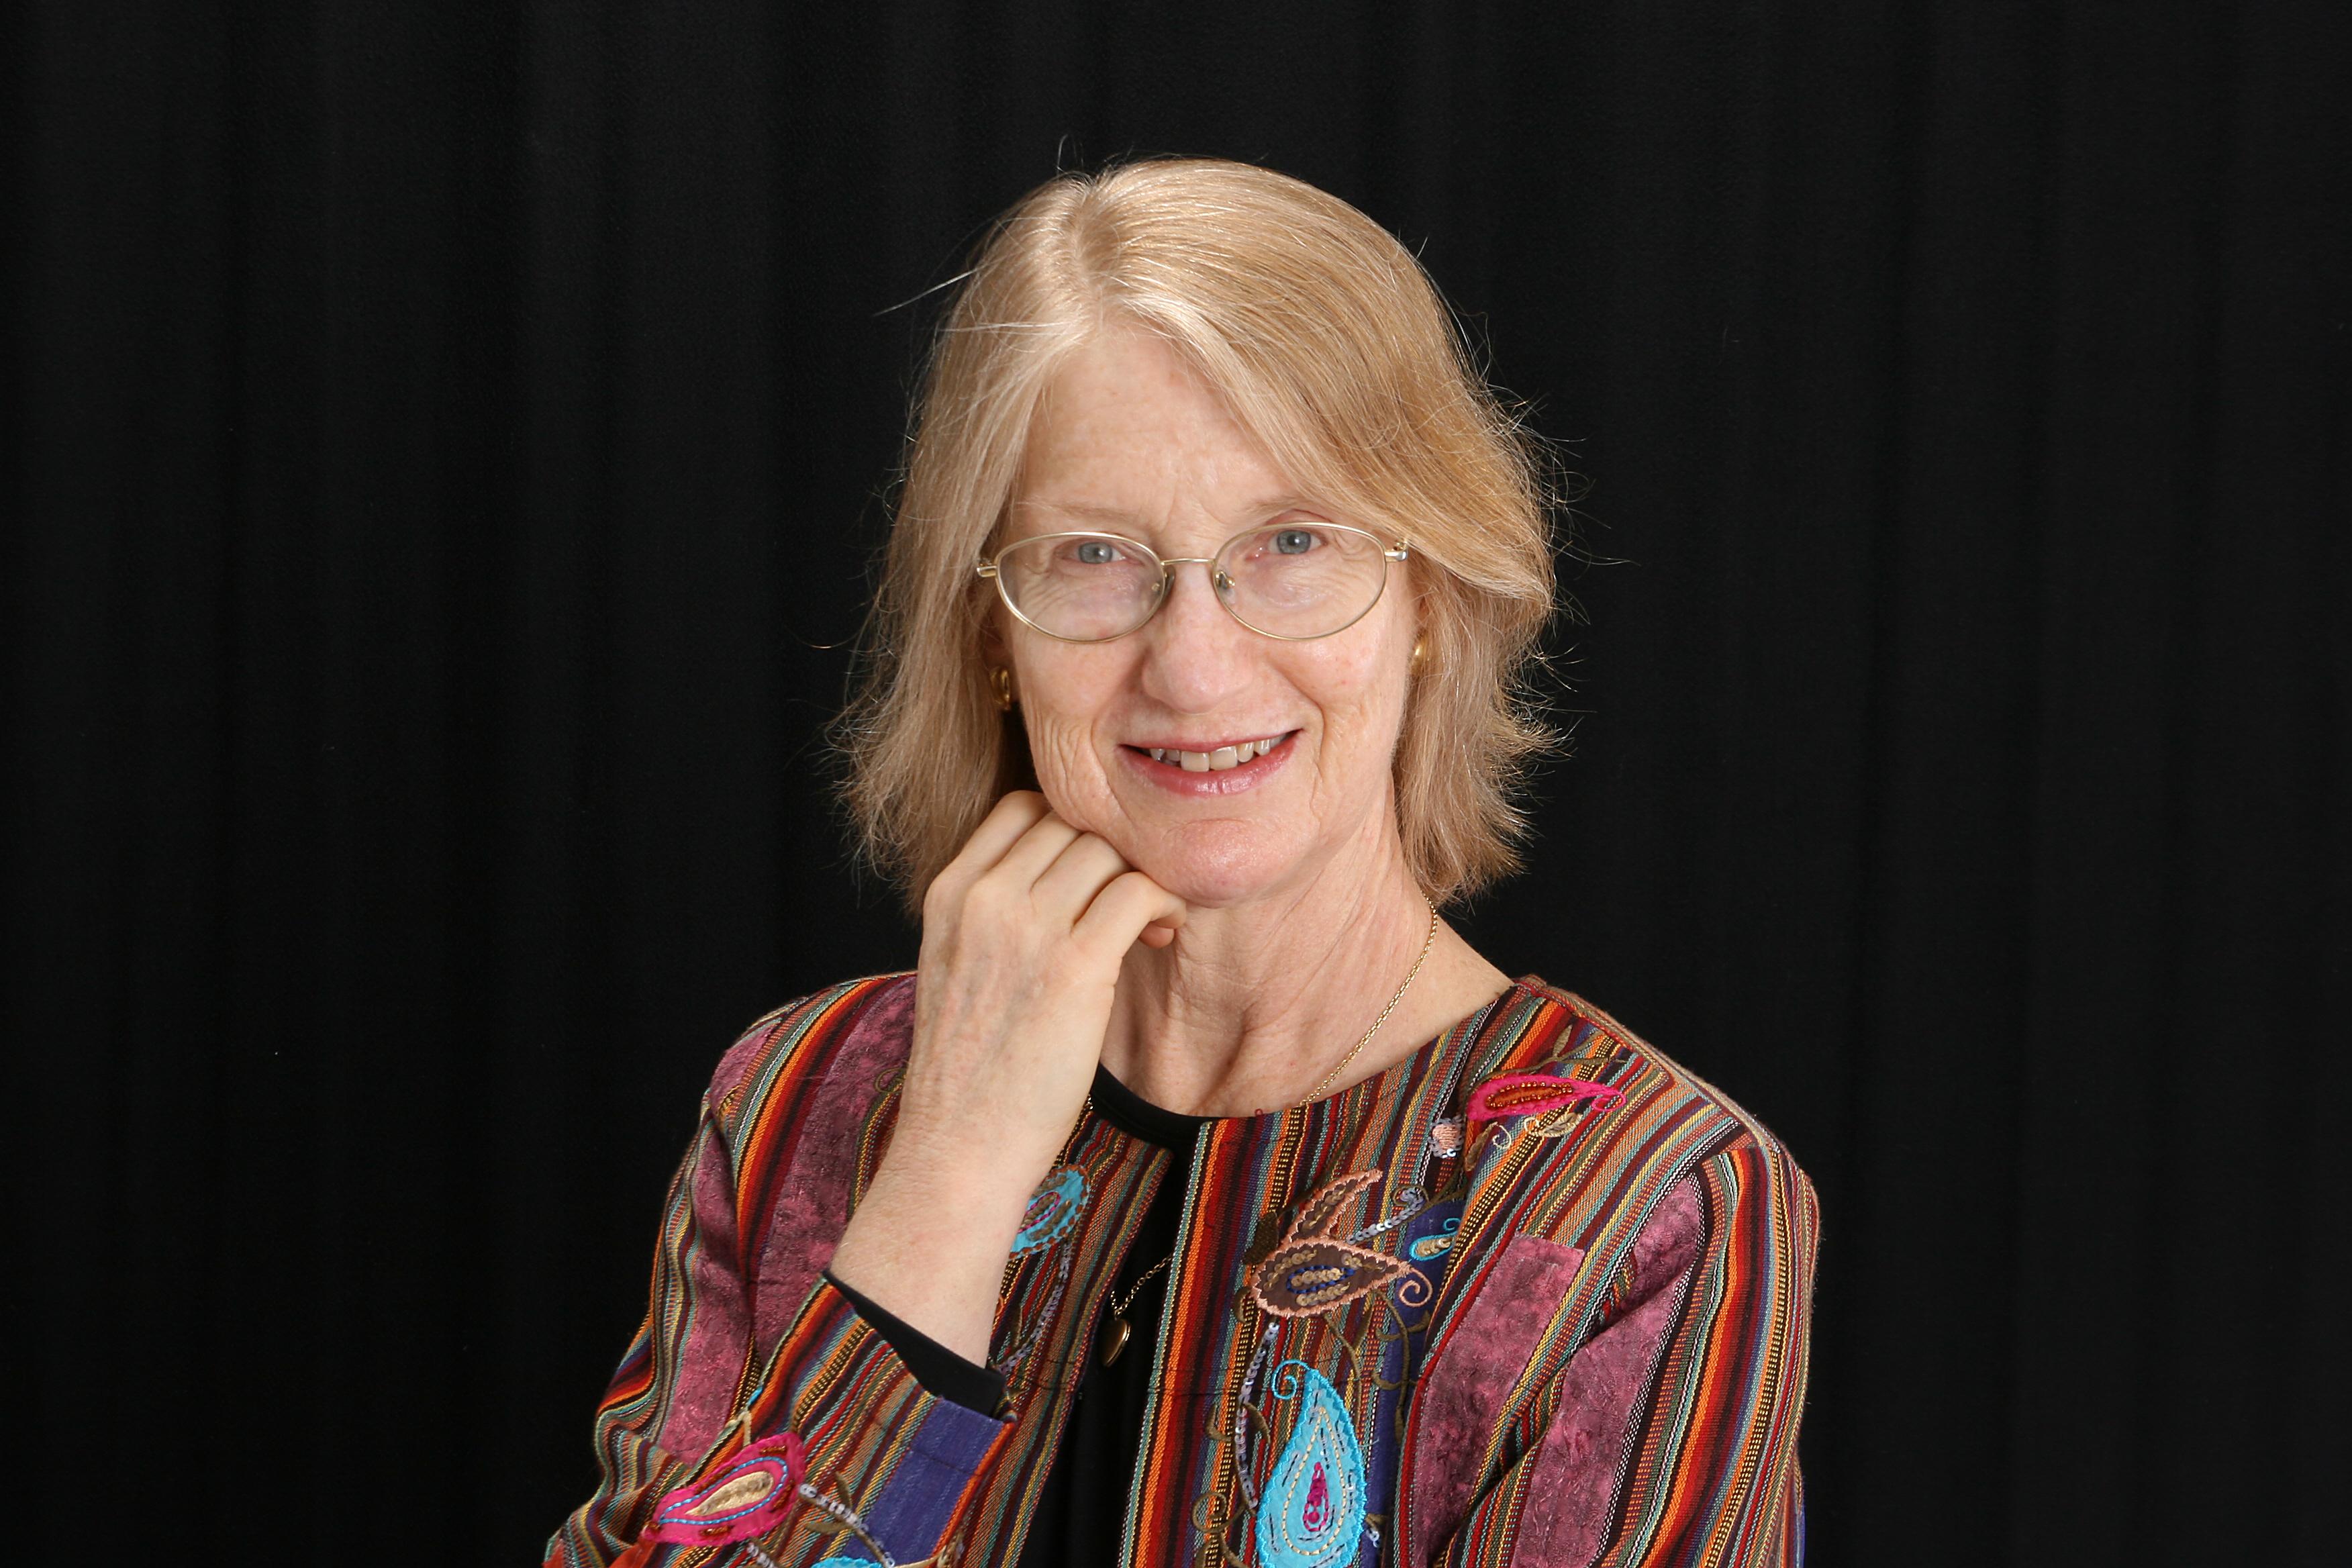 Gillian Clissold, LPC